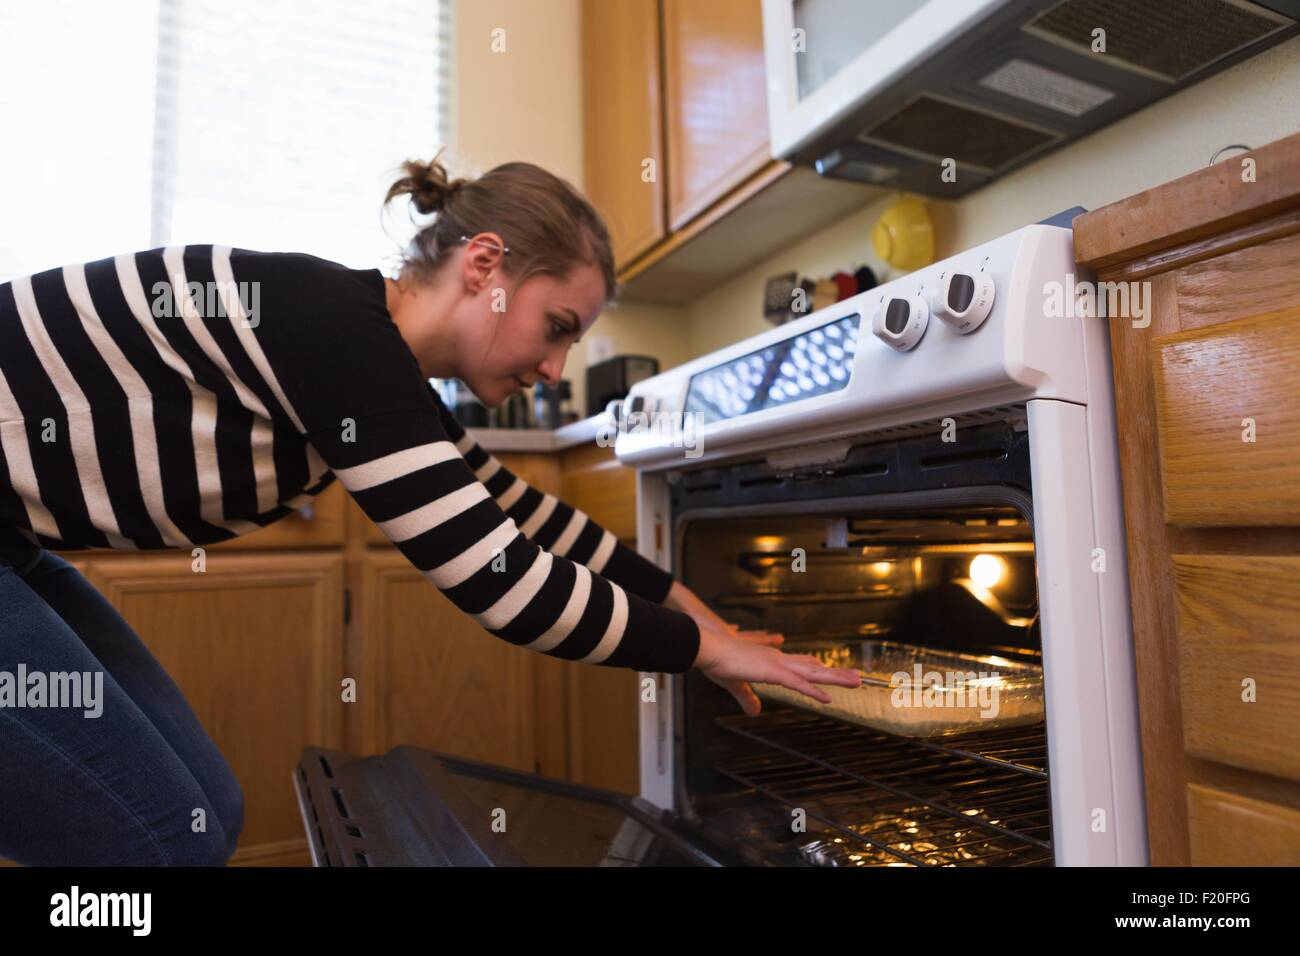 Woman baking in kitchen Photo Stock